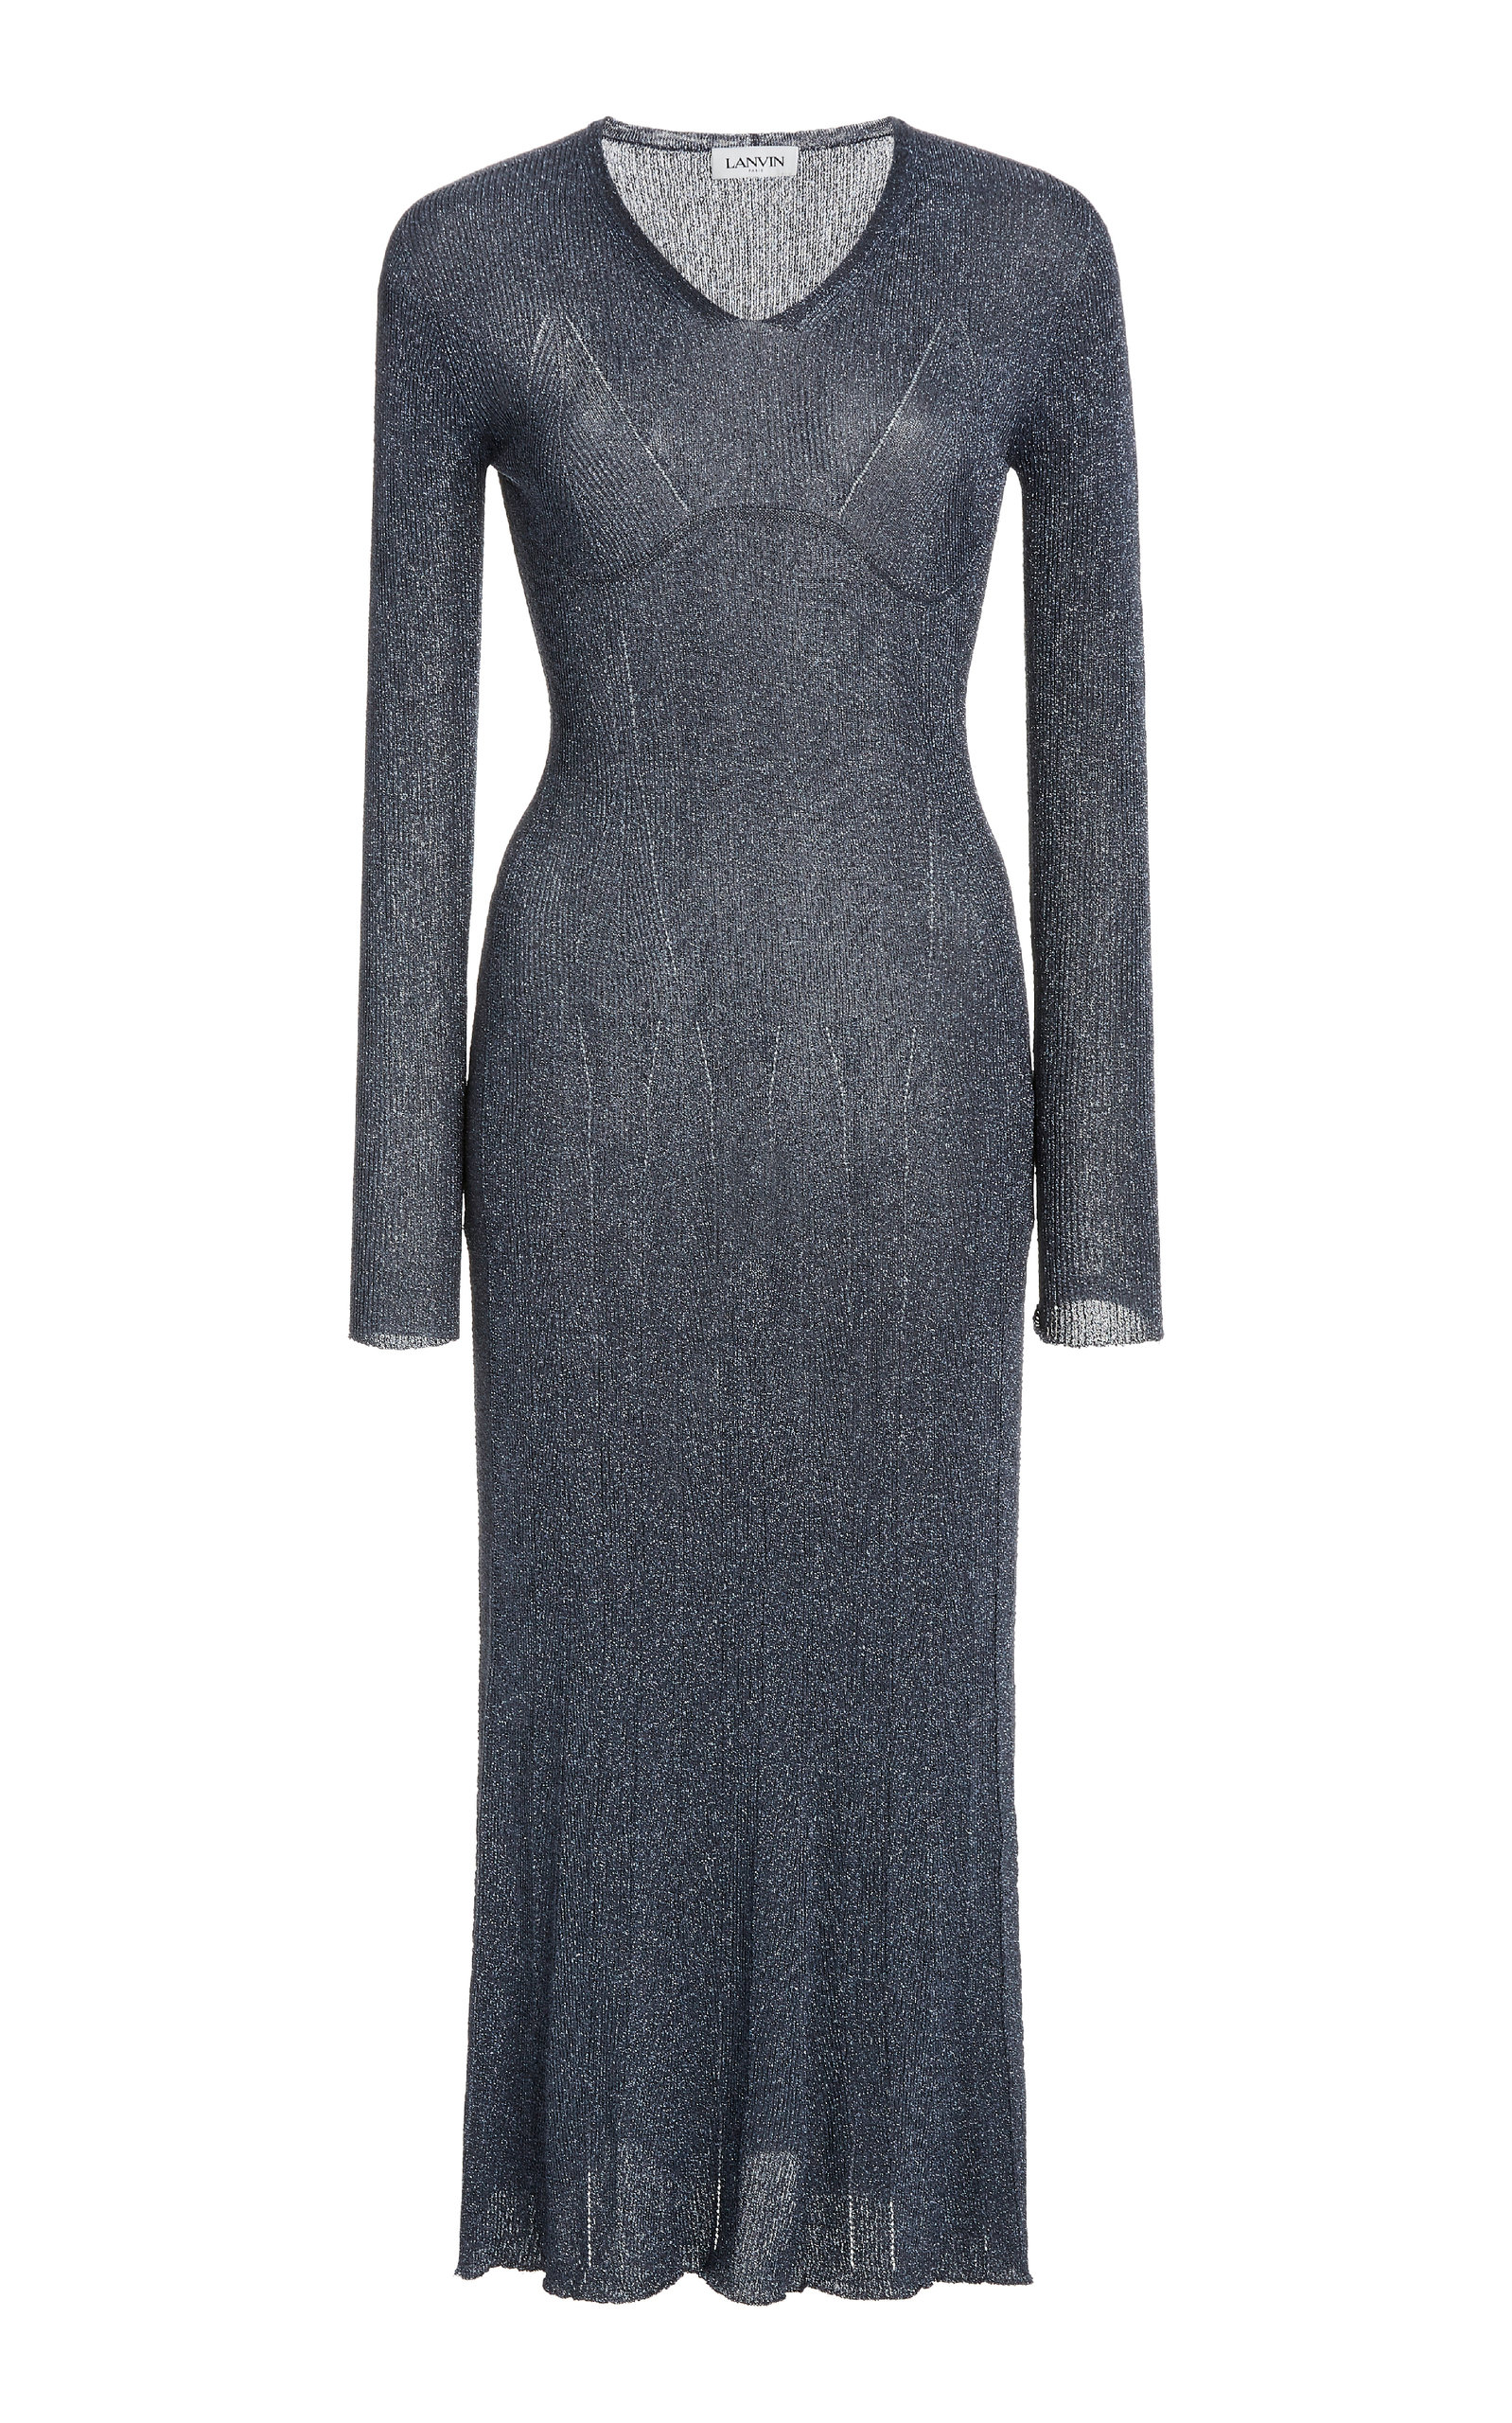 Buy Lanvin Knitted Lurex Midi Dress online, shop Lanvin at the best price